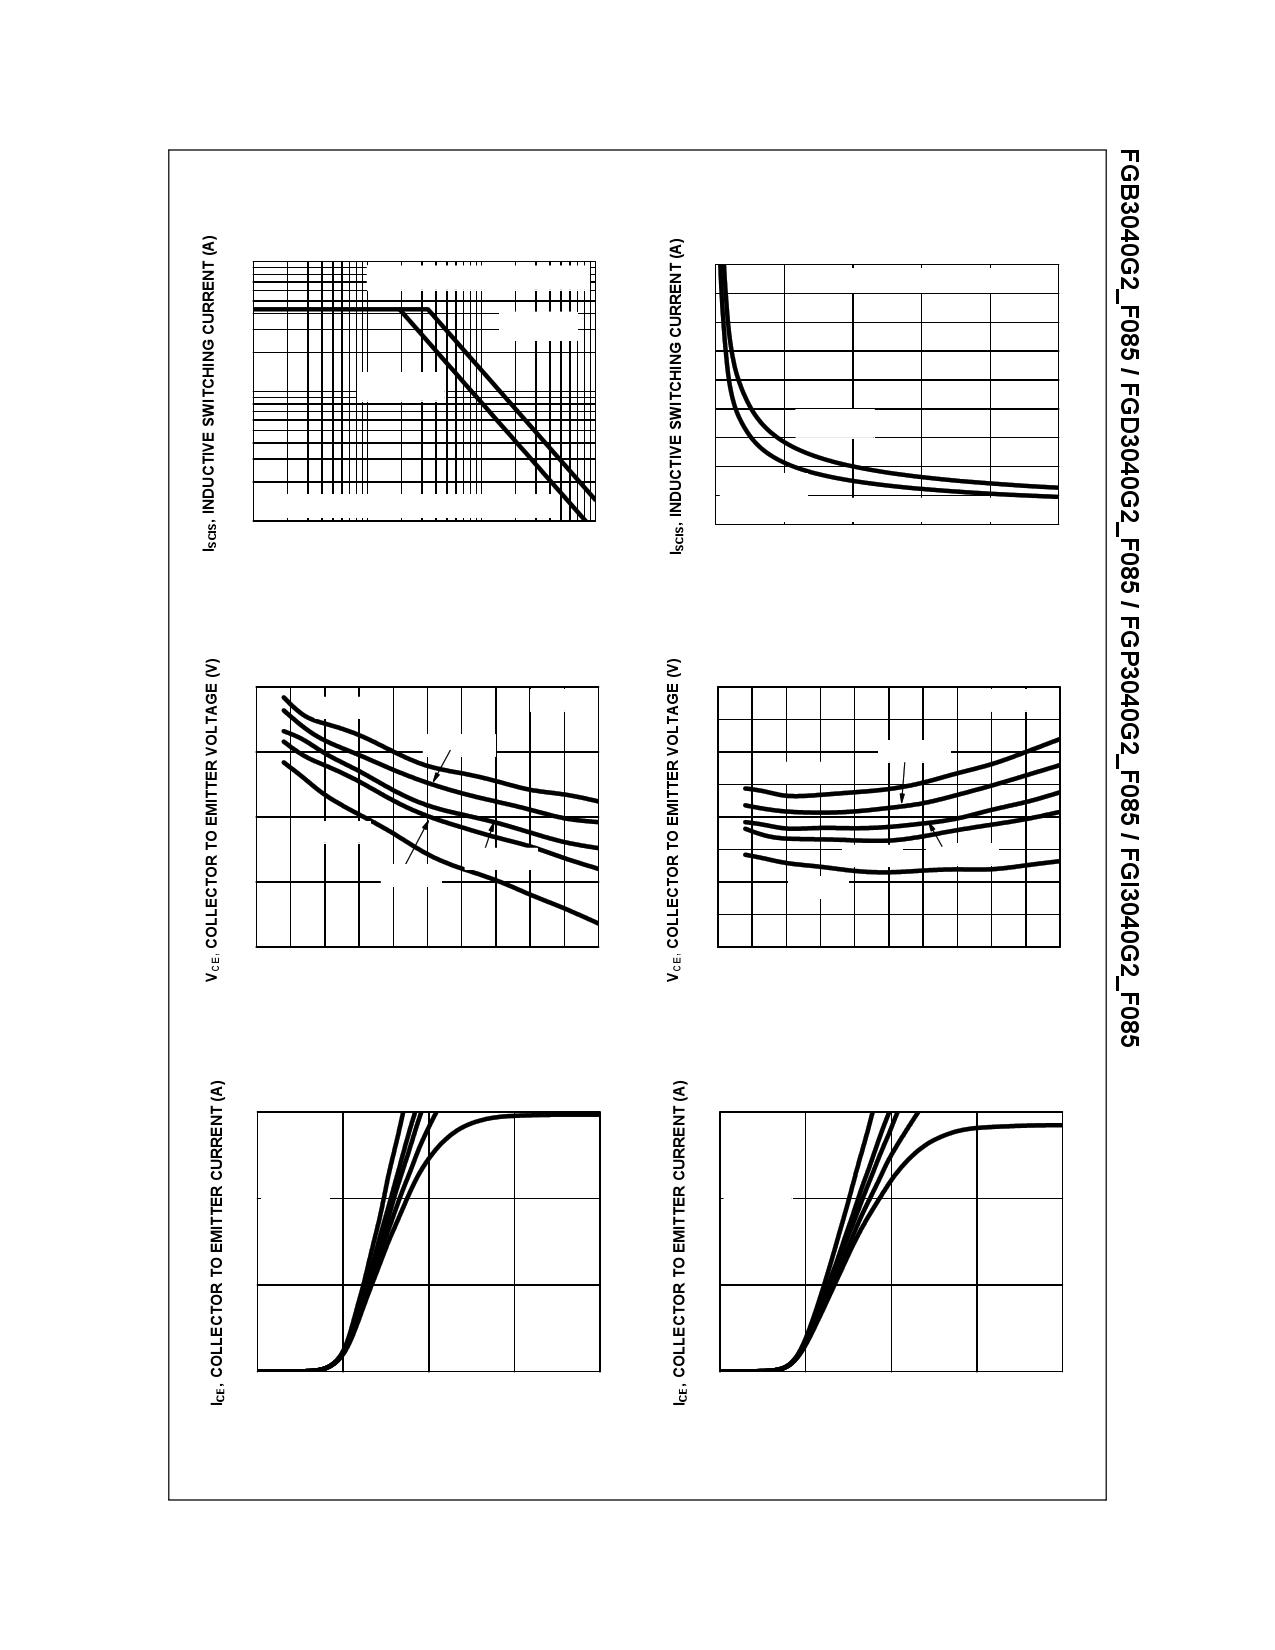 FGI3040G2_F085 pdf, 반도체, 판매, 대치품